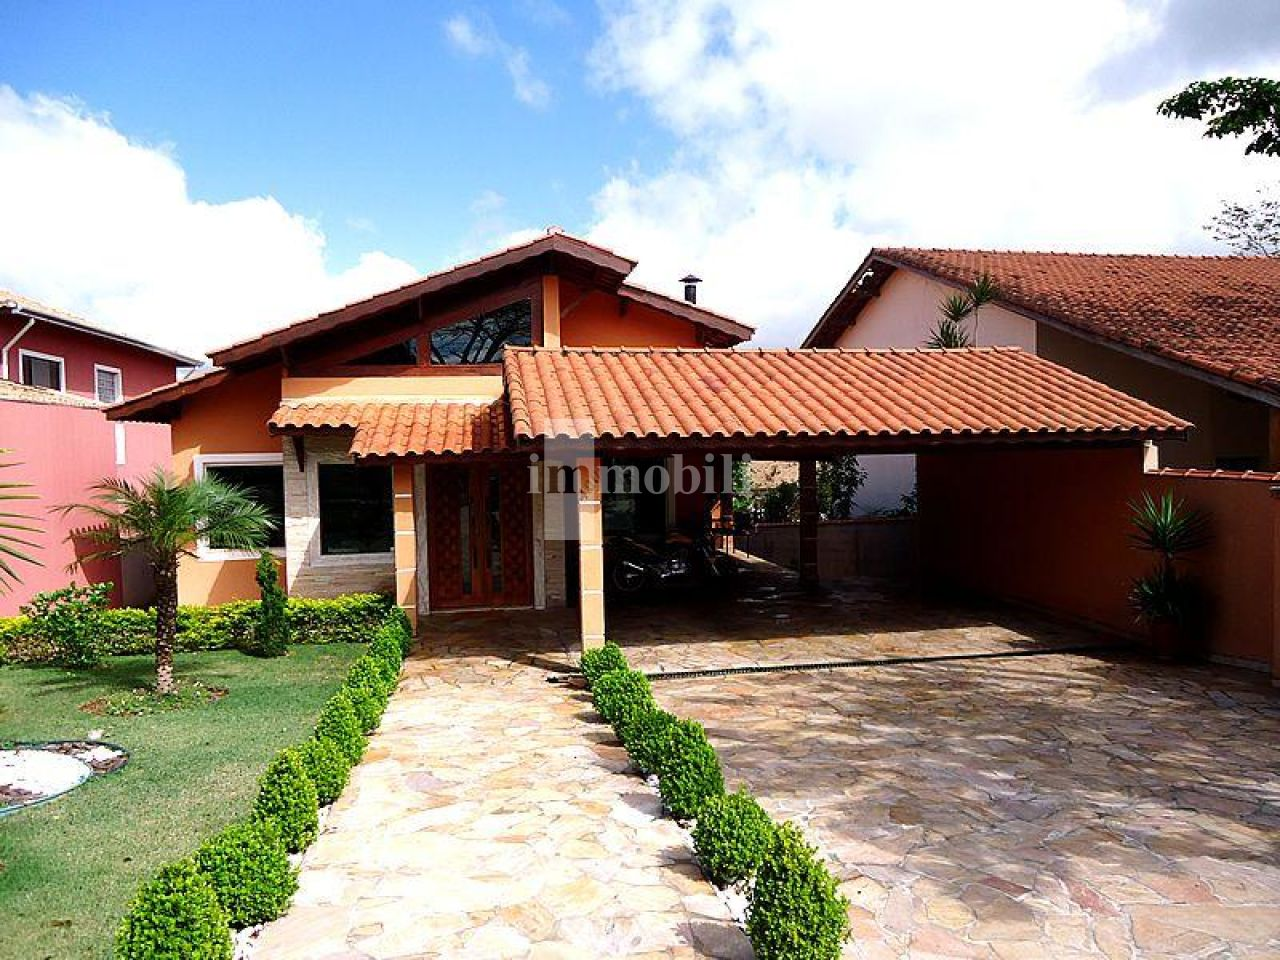 Casa Em Condomínio para Venda - Paysage Vert